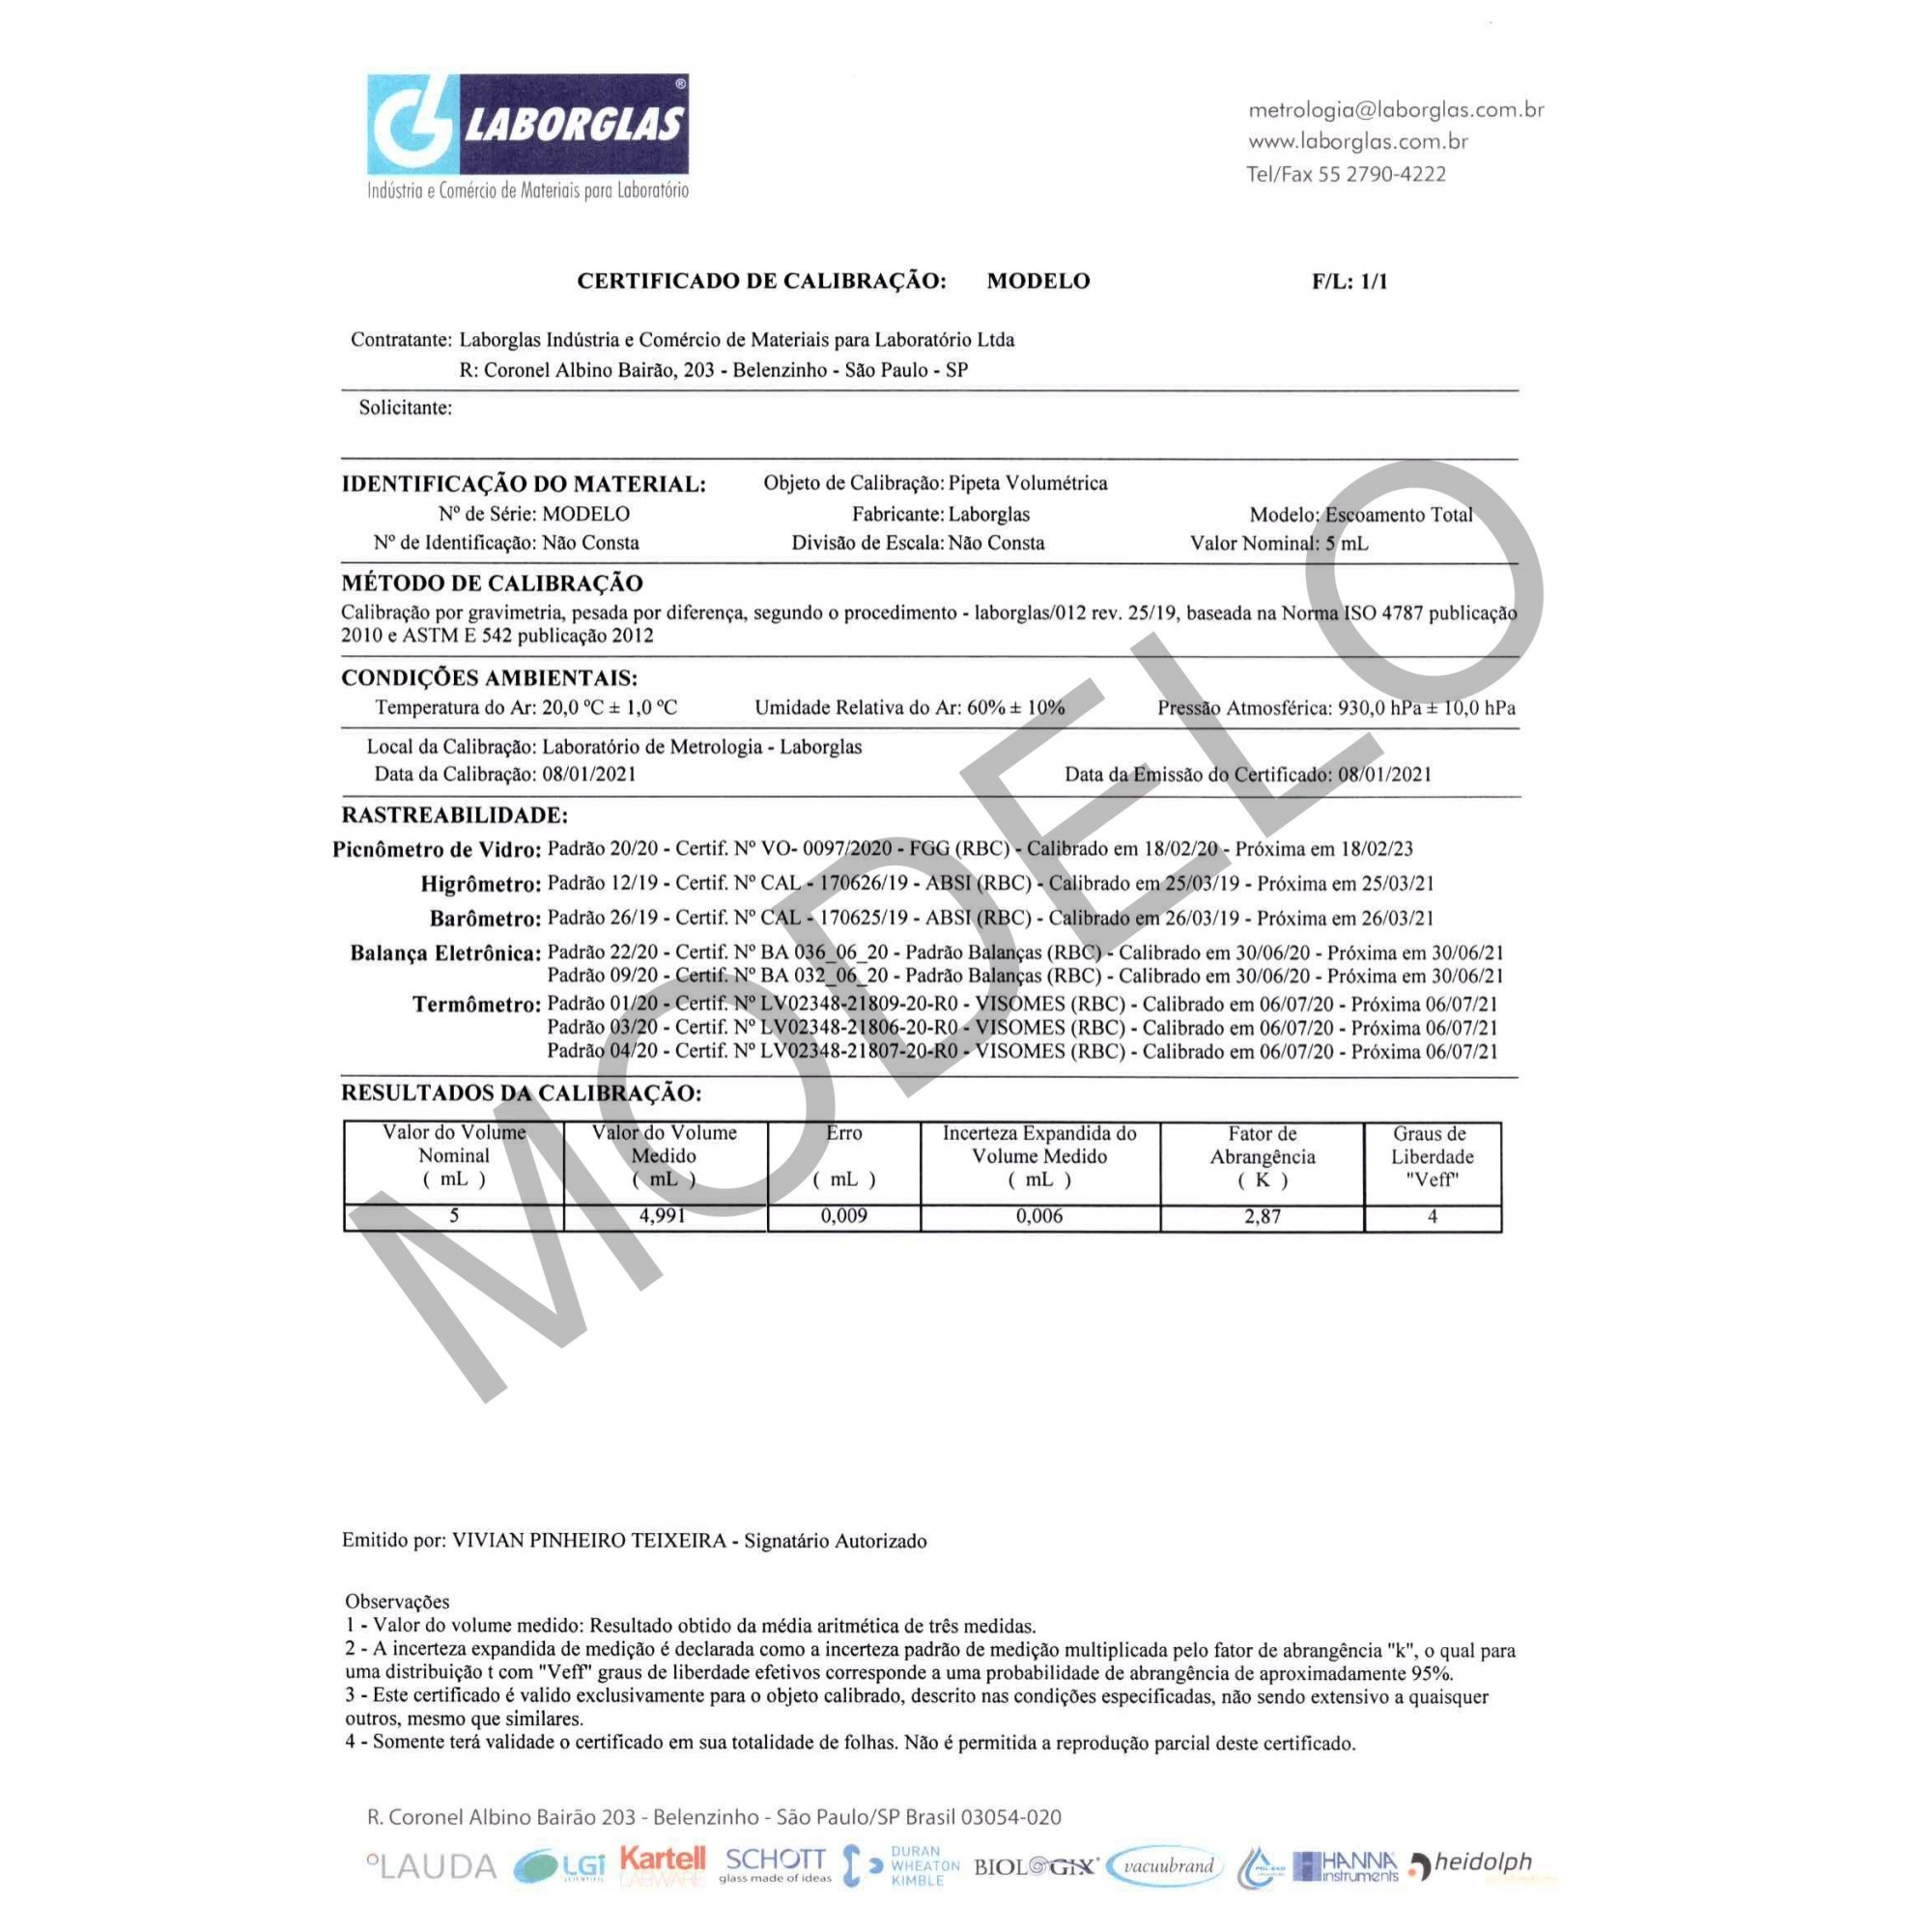 PIPETA VOLUMÉTRICA ESGOTAMENTO TOTAL CLASSE A  50 ML COM CERTIFICADO RASTREÁVEL - Laborglas - Cód. 9433816-C